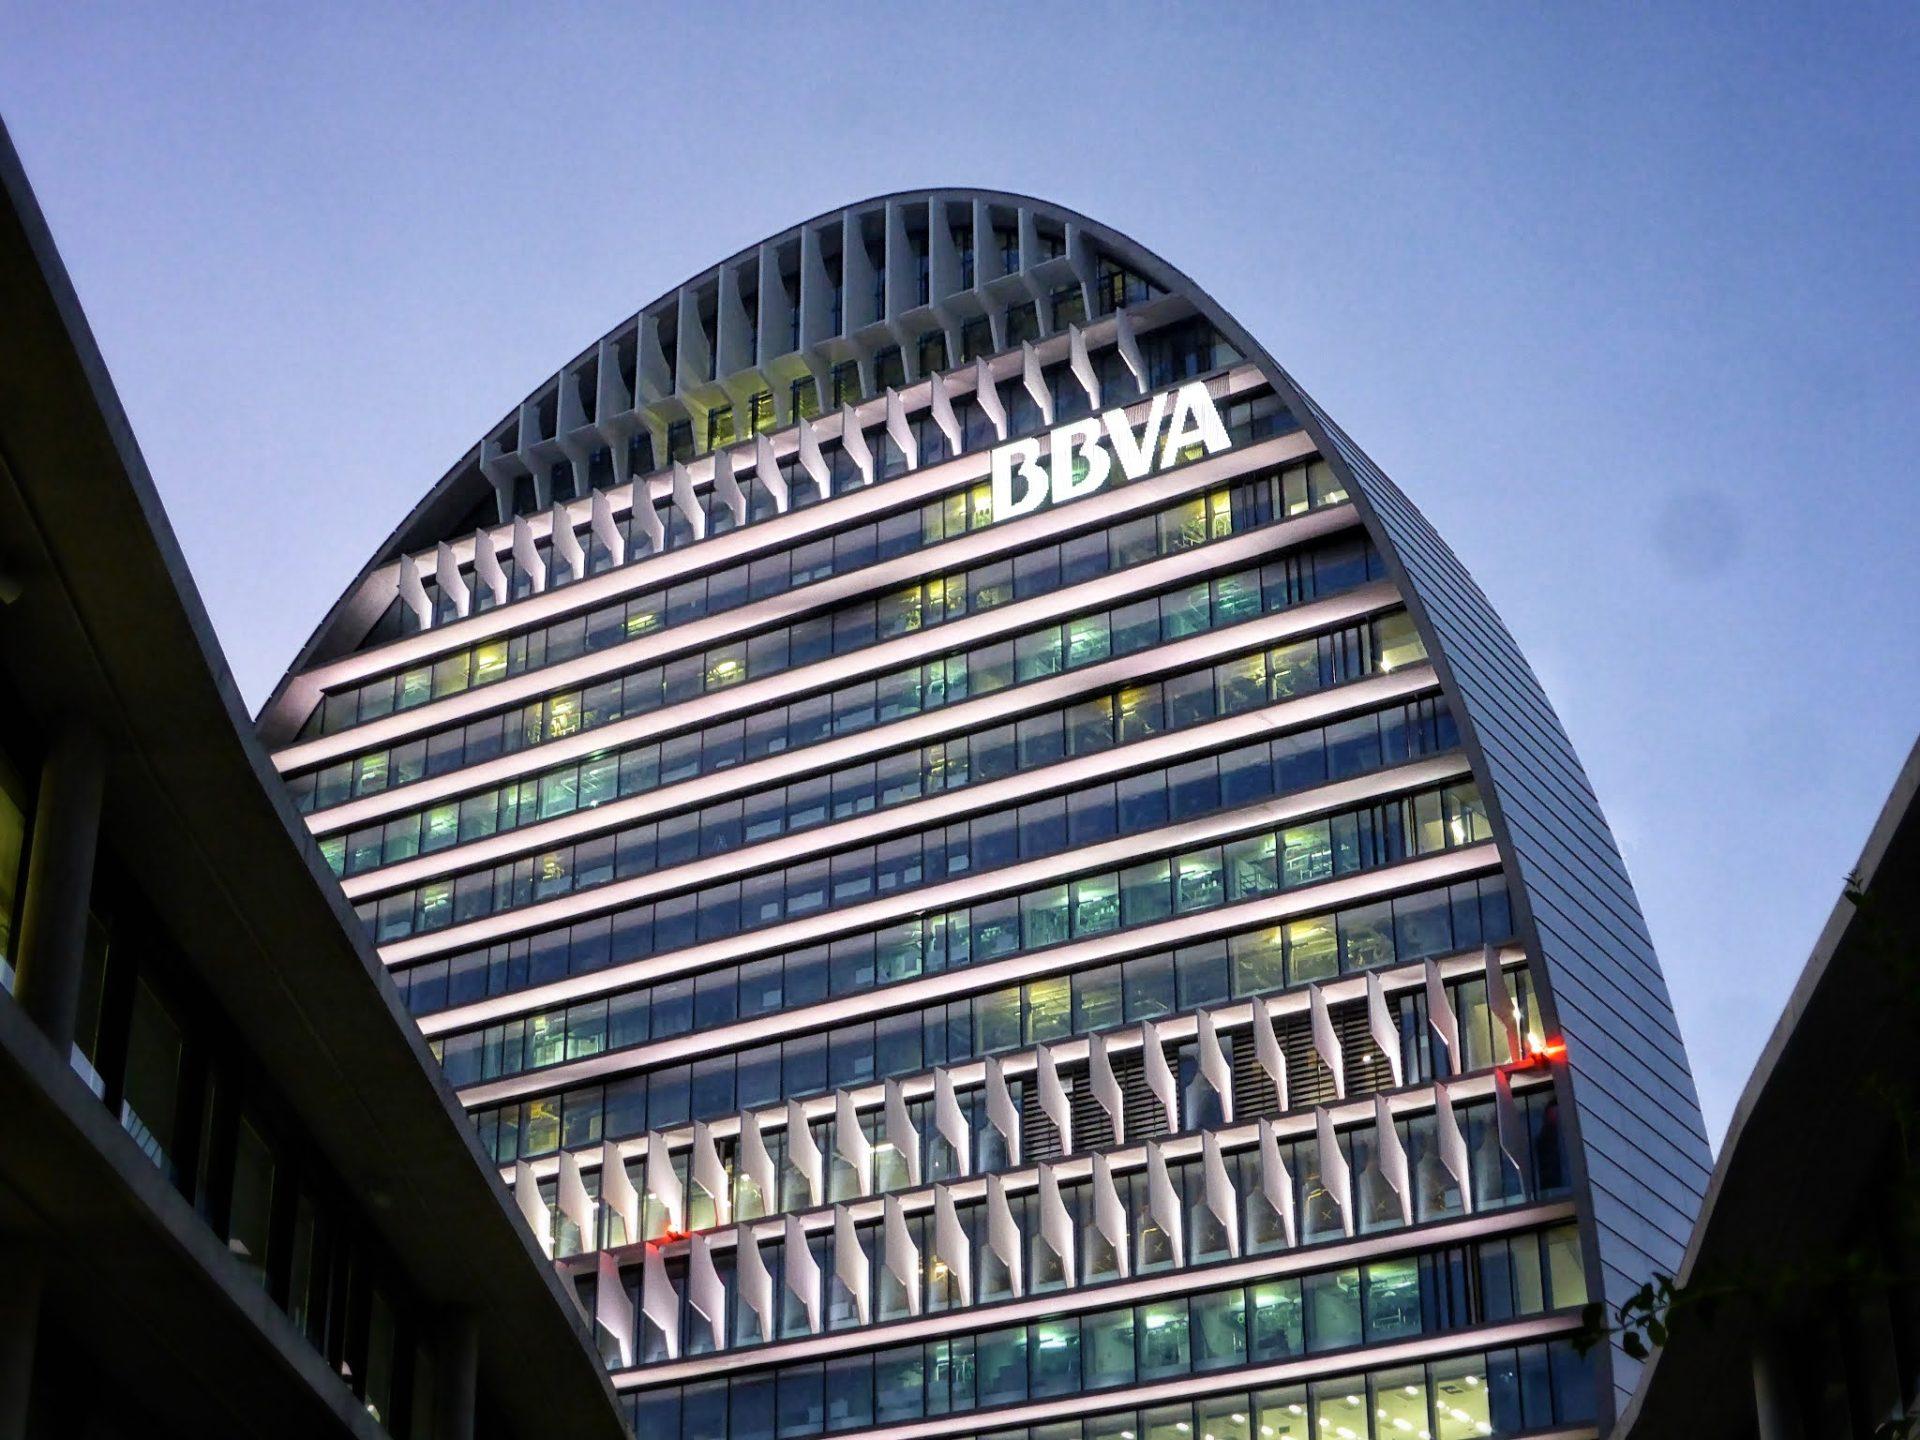 https://shareholdersandinvestors.bbva.com/wp-content/uploads/2017/07/La-Vela-Ciudad-BBVA.jpg